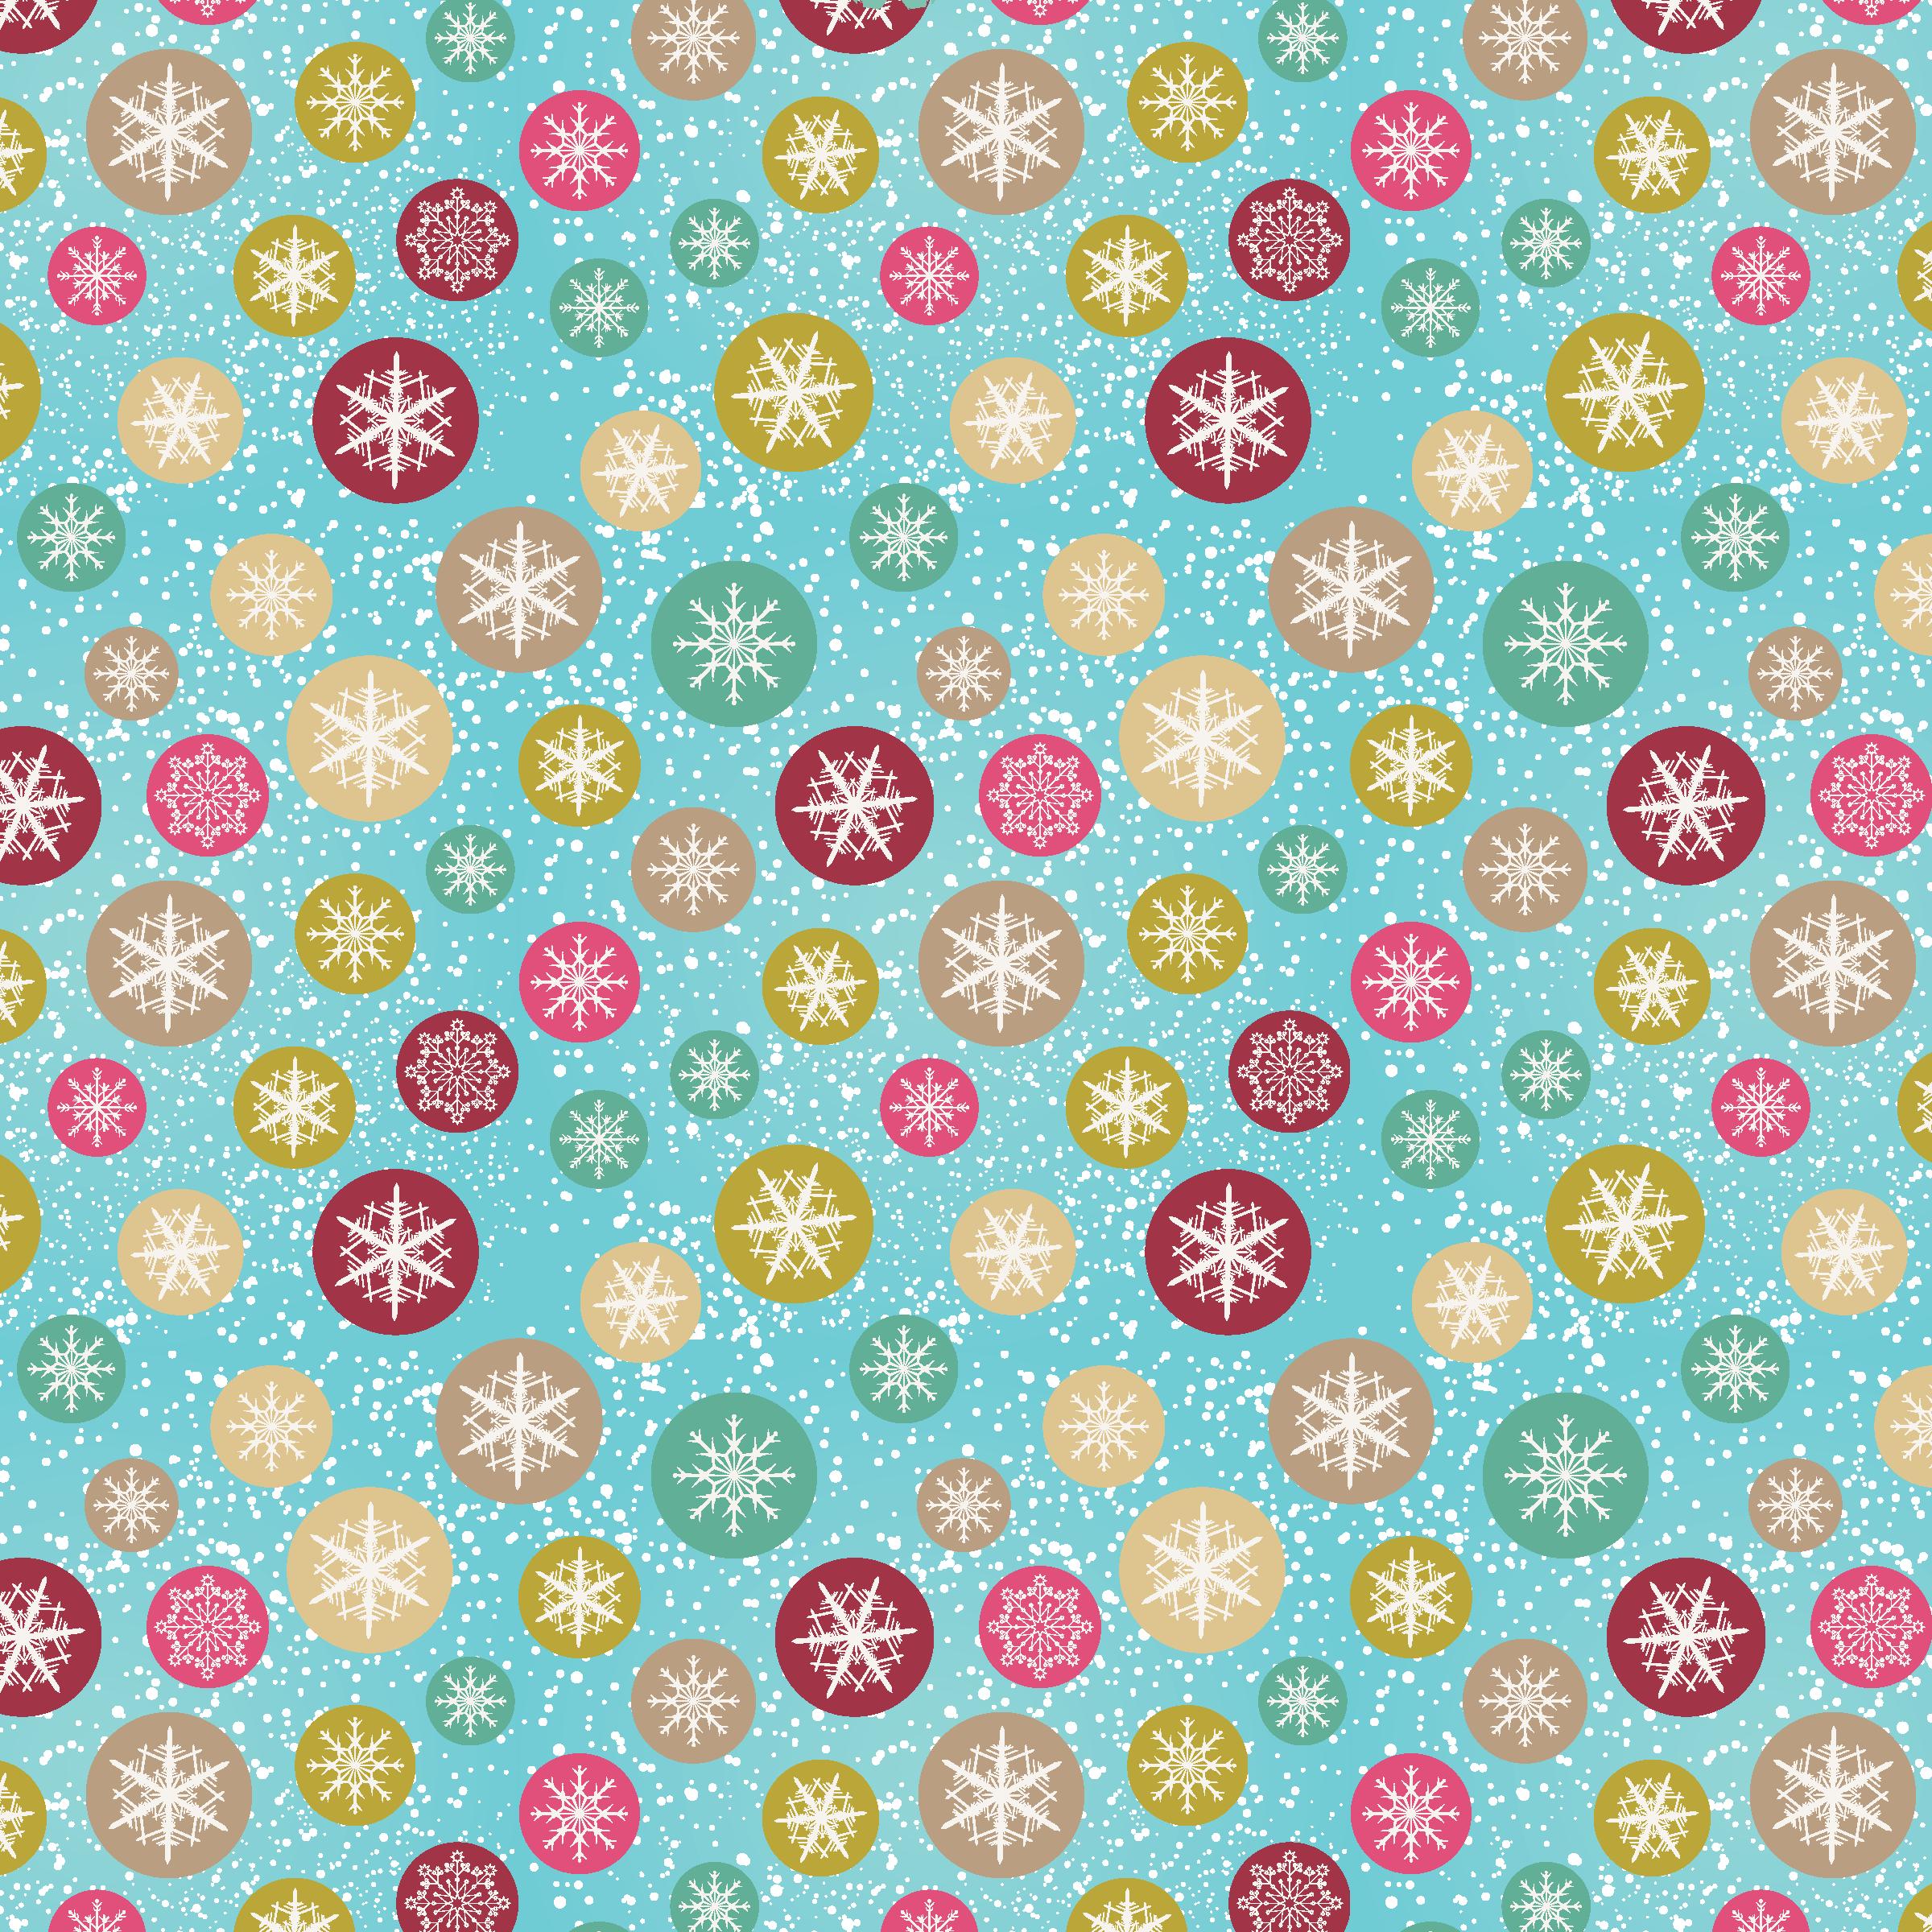 Snowflake Holidays-04